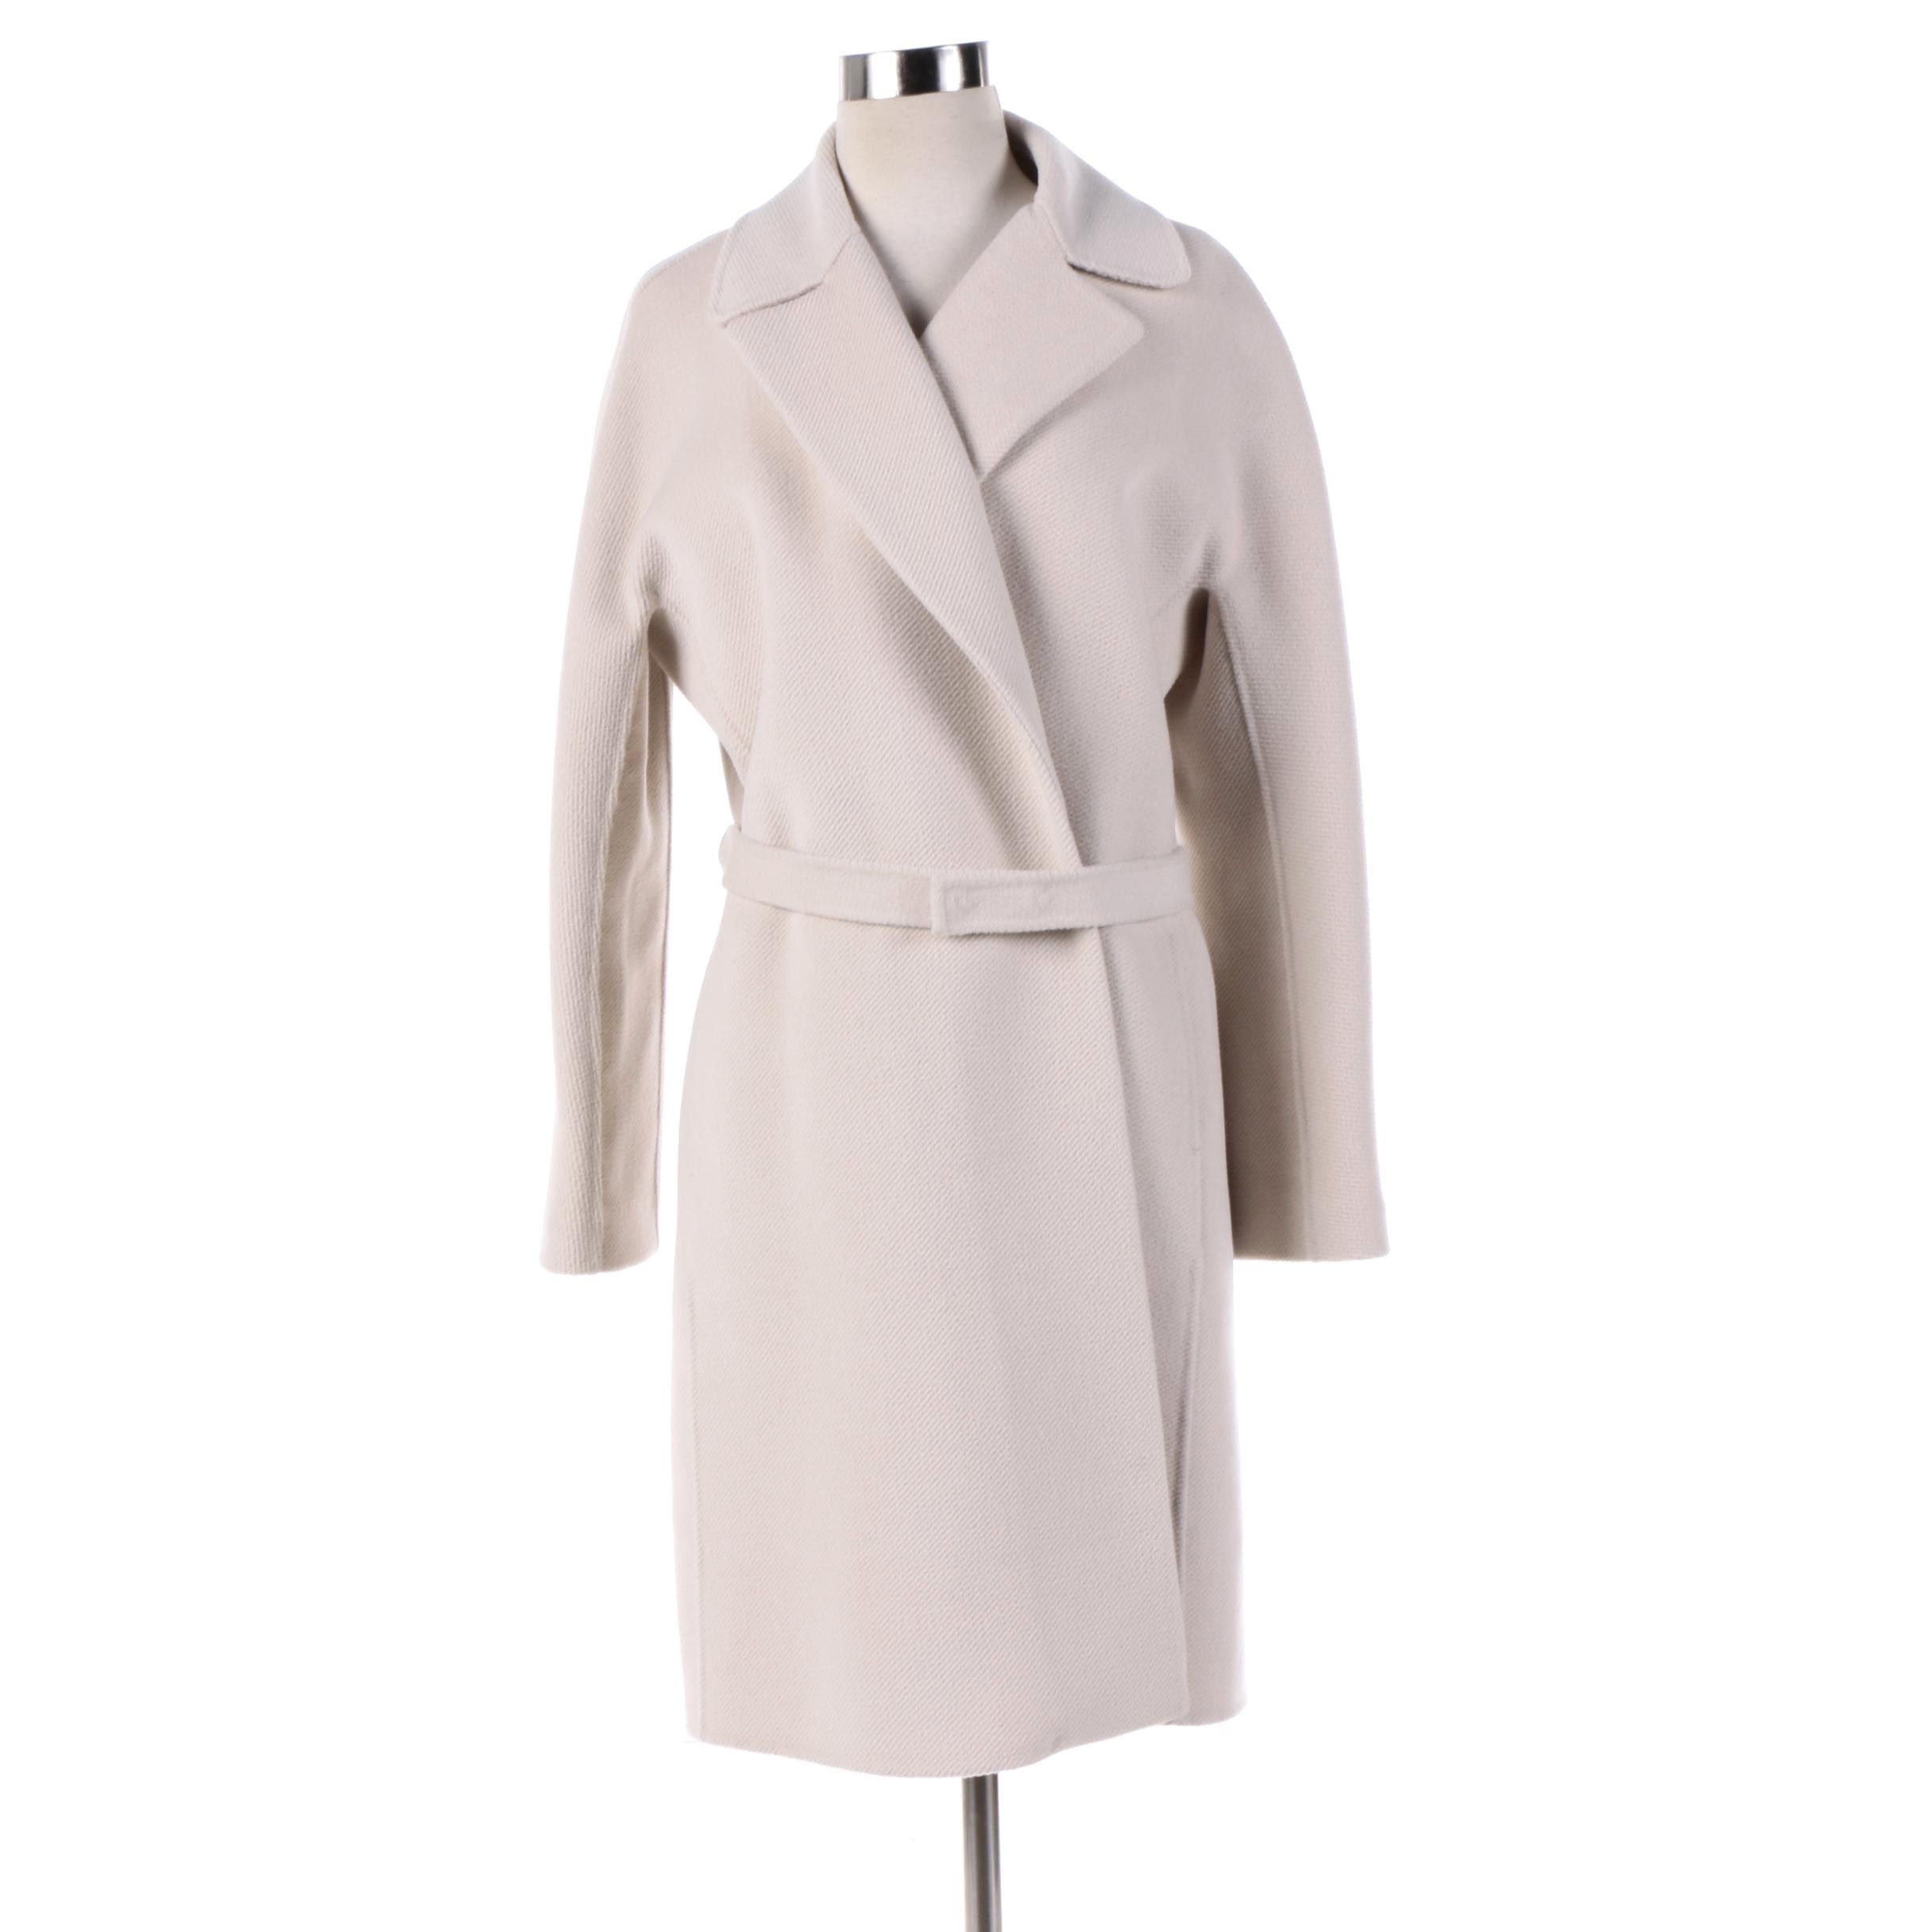 Women's Lafayette 148 New York Off-White Wool Blend Coat